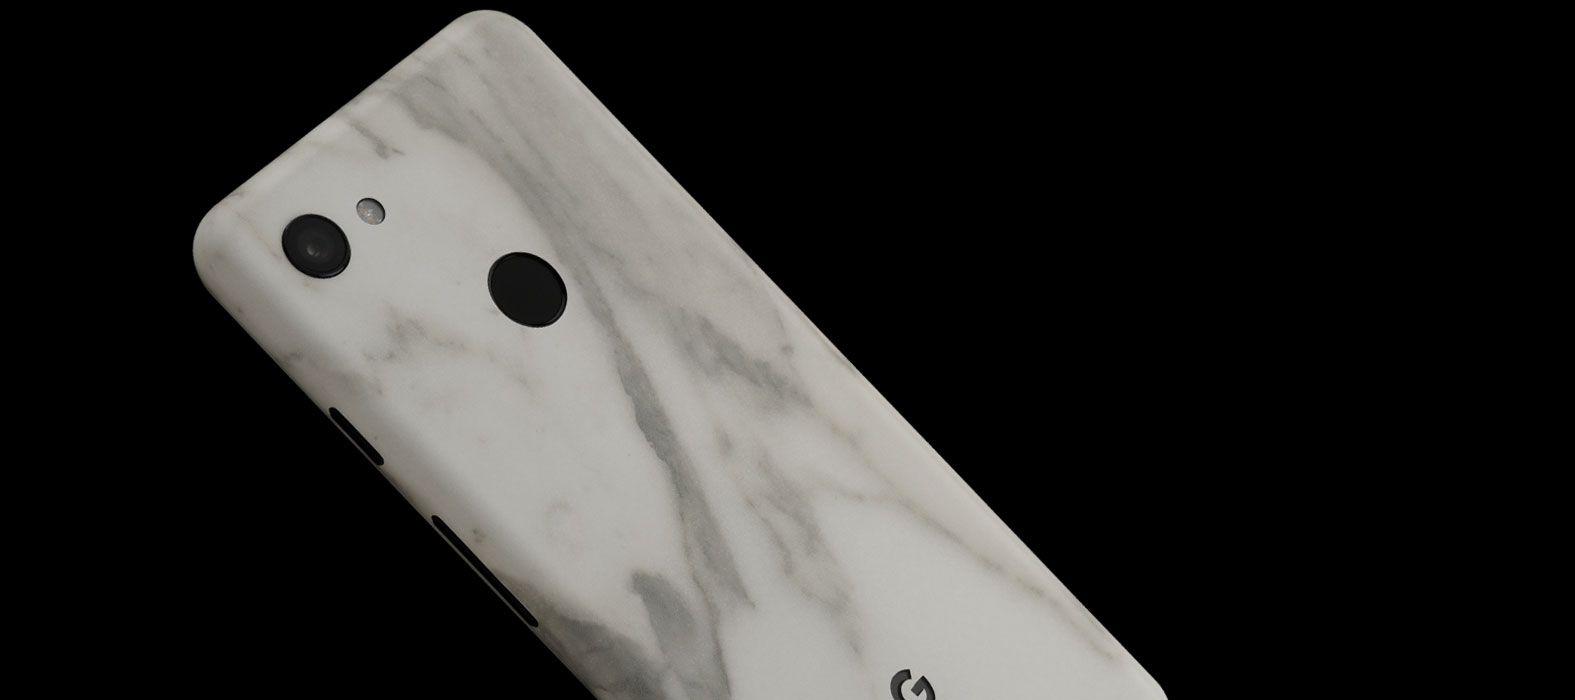 Pixel-3aXL-White-Marble--skins